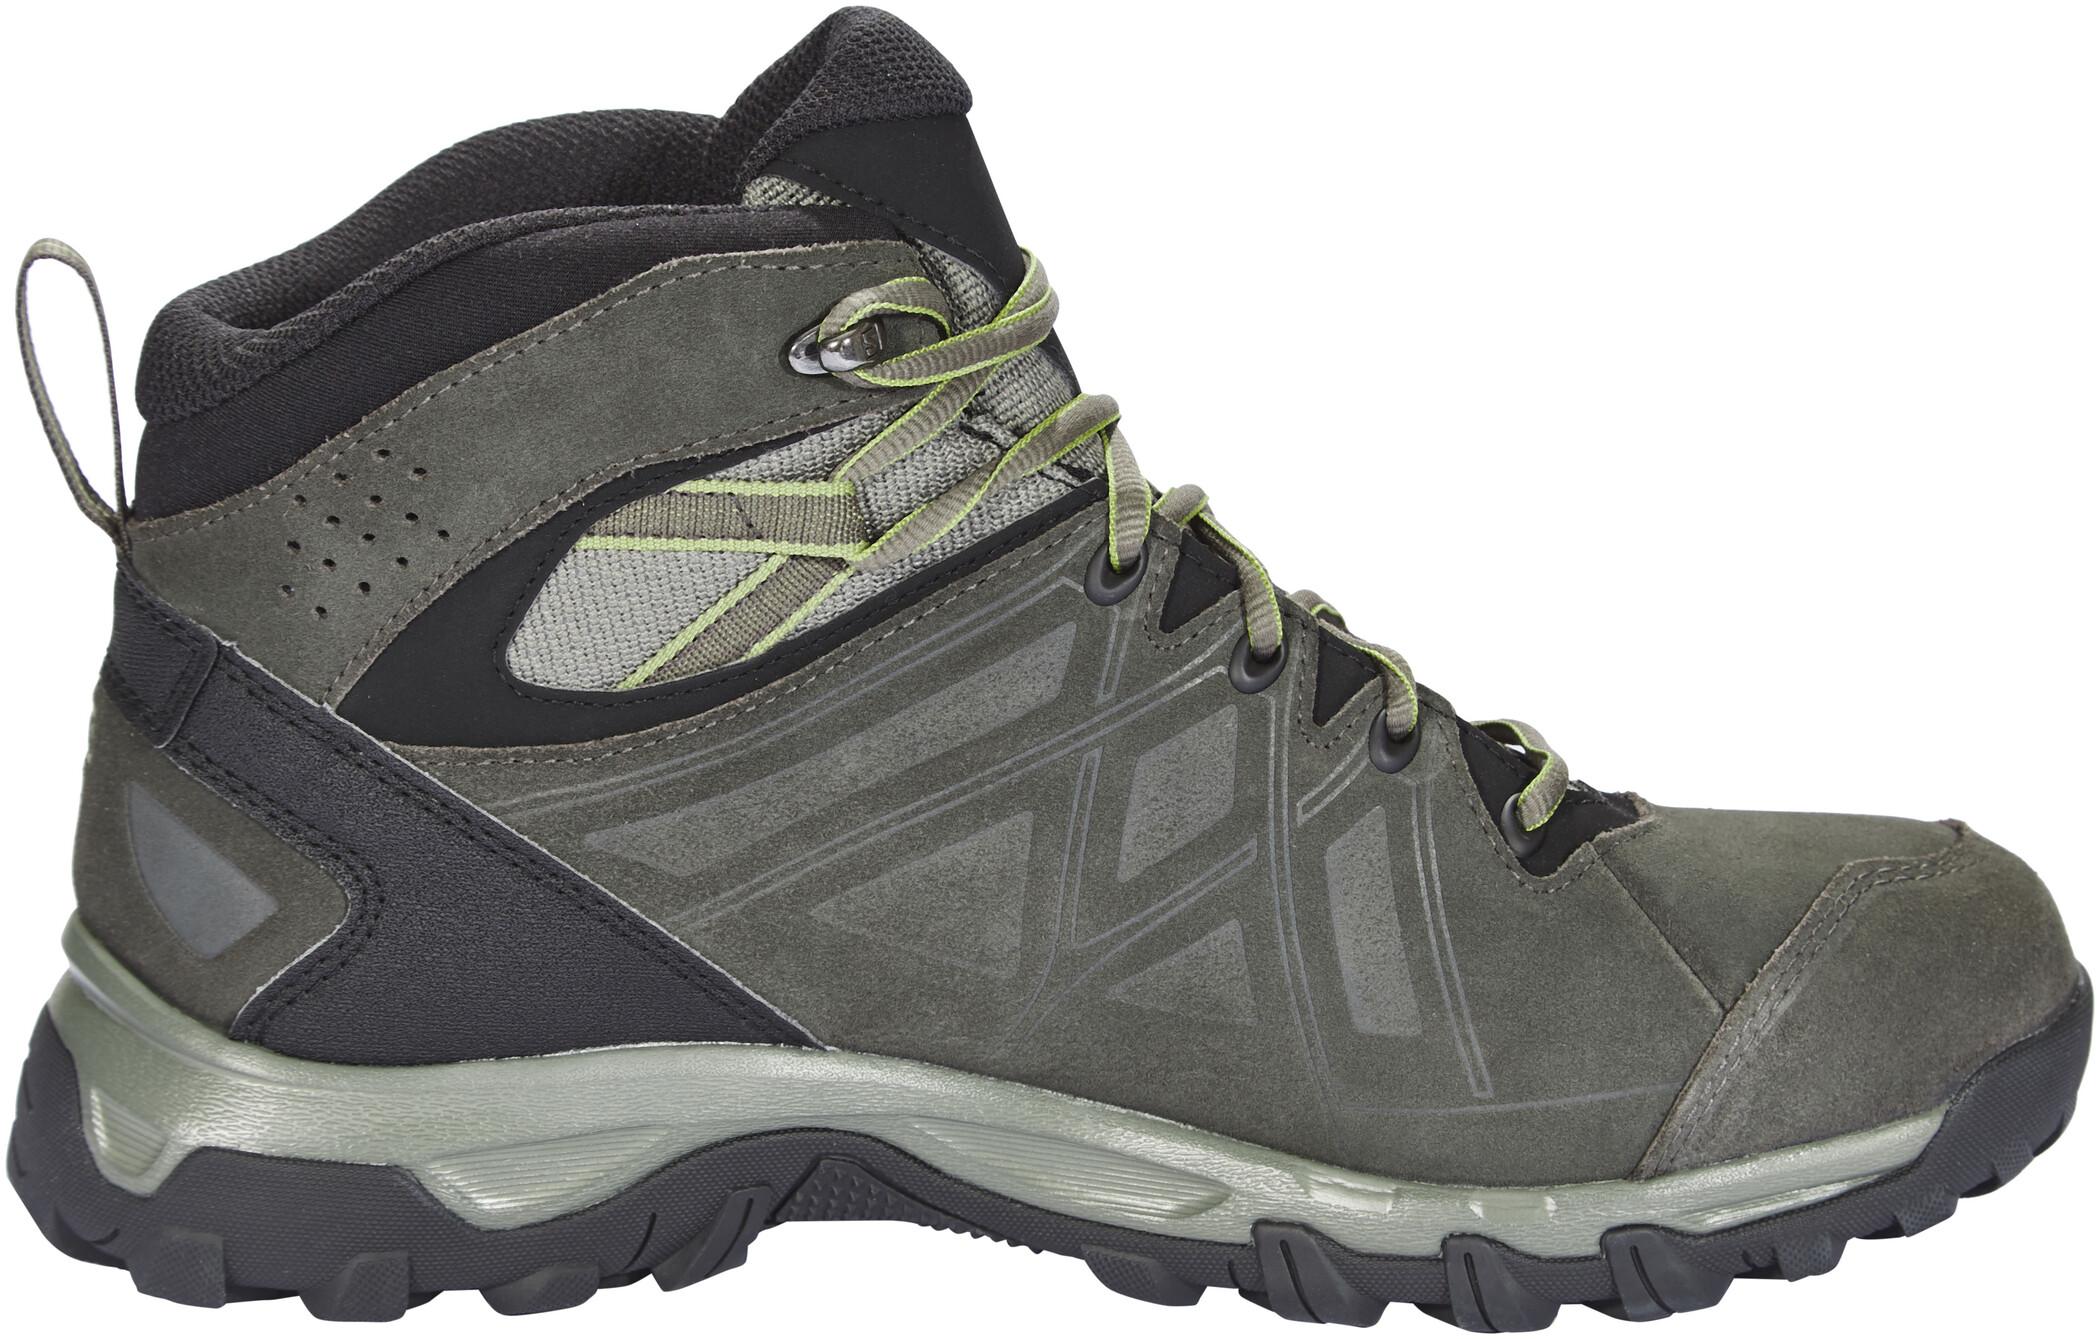 Salomon Evasion 2 Mid LTR GTX Shoes Herr castor graybelugaguacamole